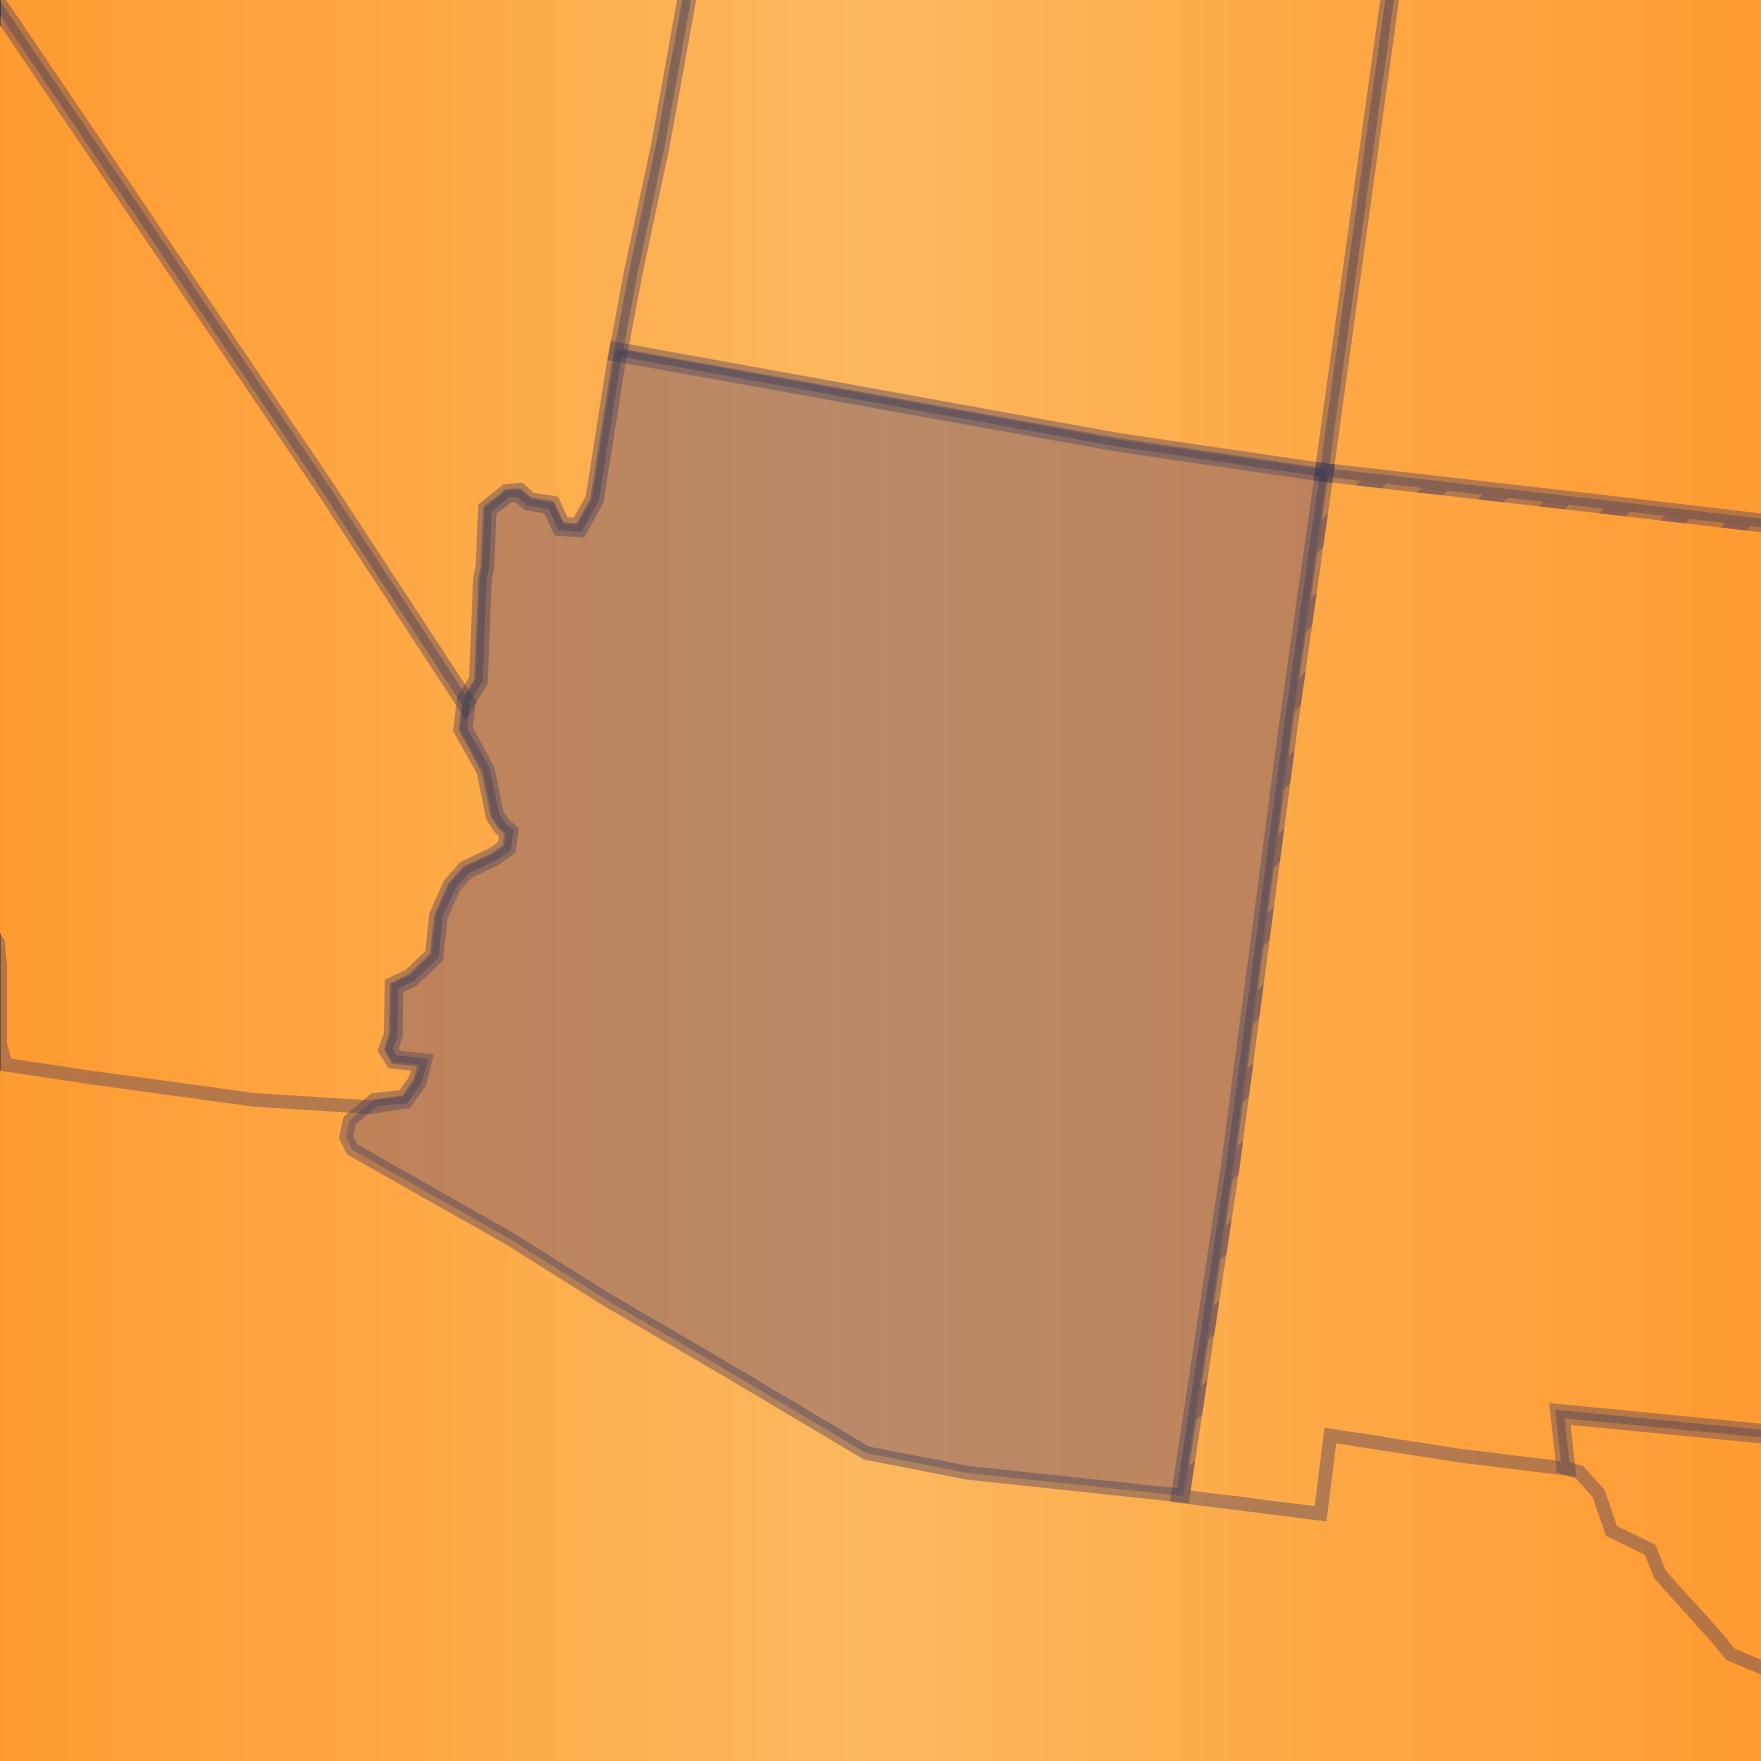 COMING SOON - ARIZONA STATE INDEX